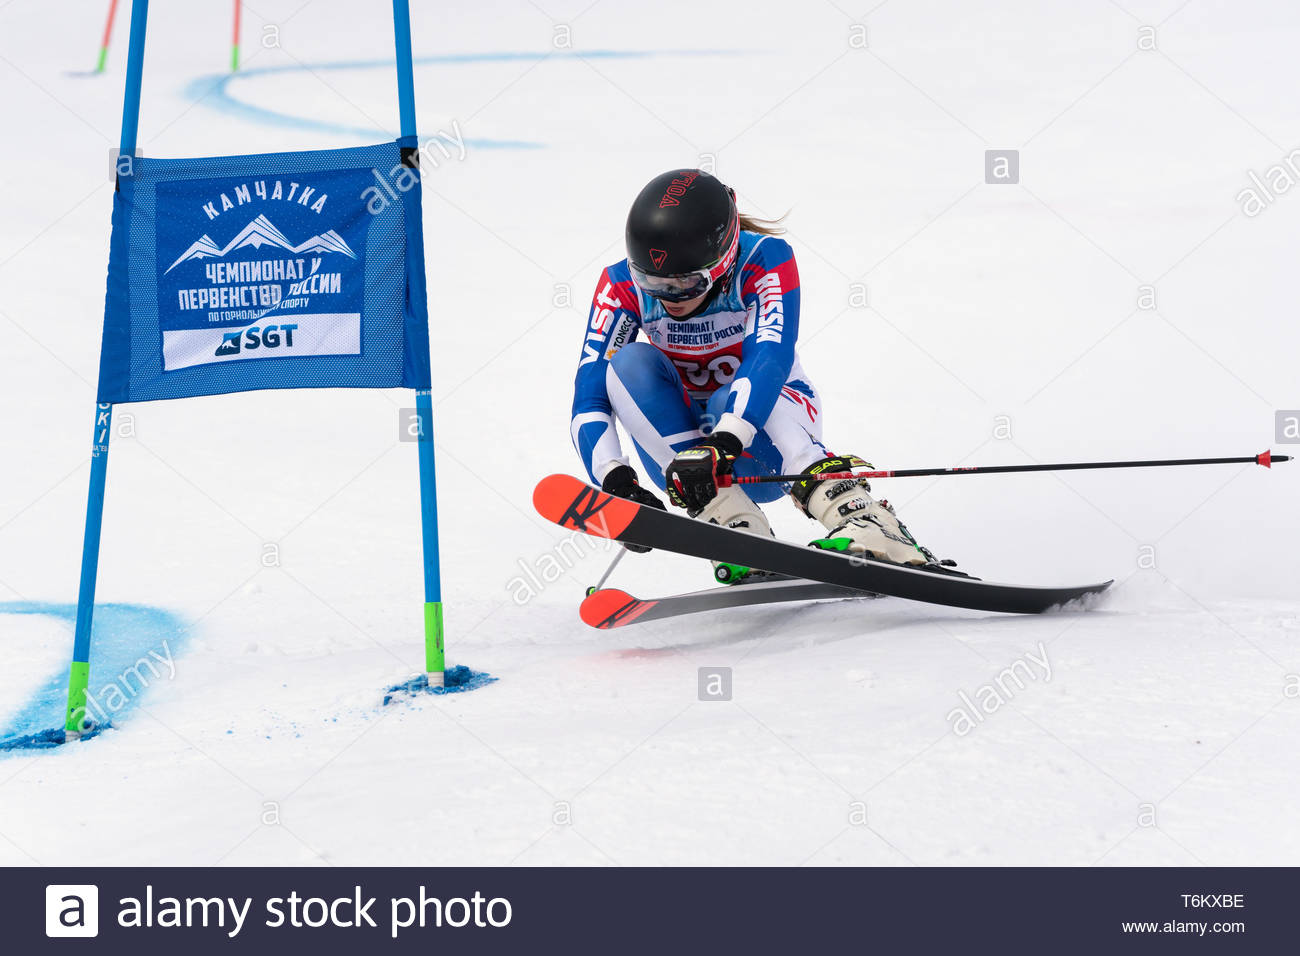 KAMCHATKA PENINSULA, RUSSIA - APRIL 2, 2019: Mountain skier Lendya Ulyana (Kamchatka) skiing down mount slope. International Ski Federation Championsh - Stock Image